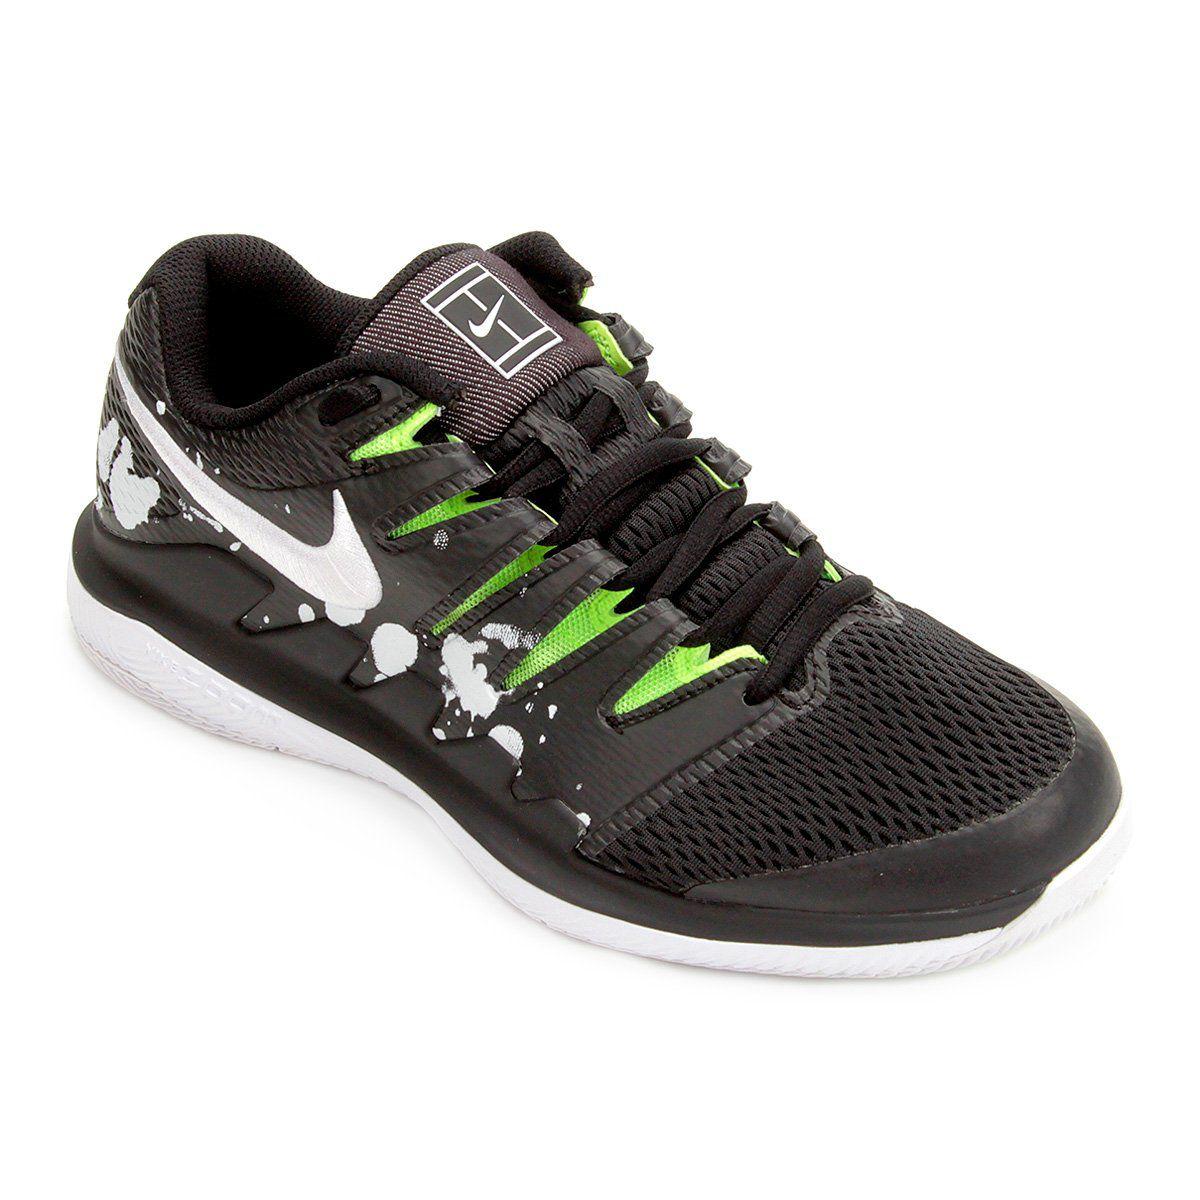 Tênis Nike Air Zoom Vapor X PRM Masculino - Preto e Branco